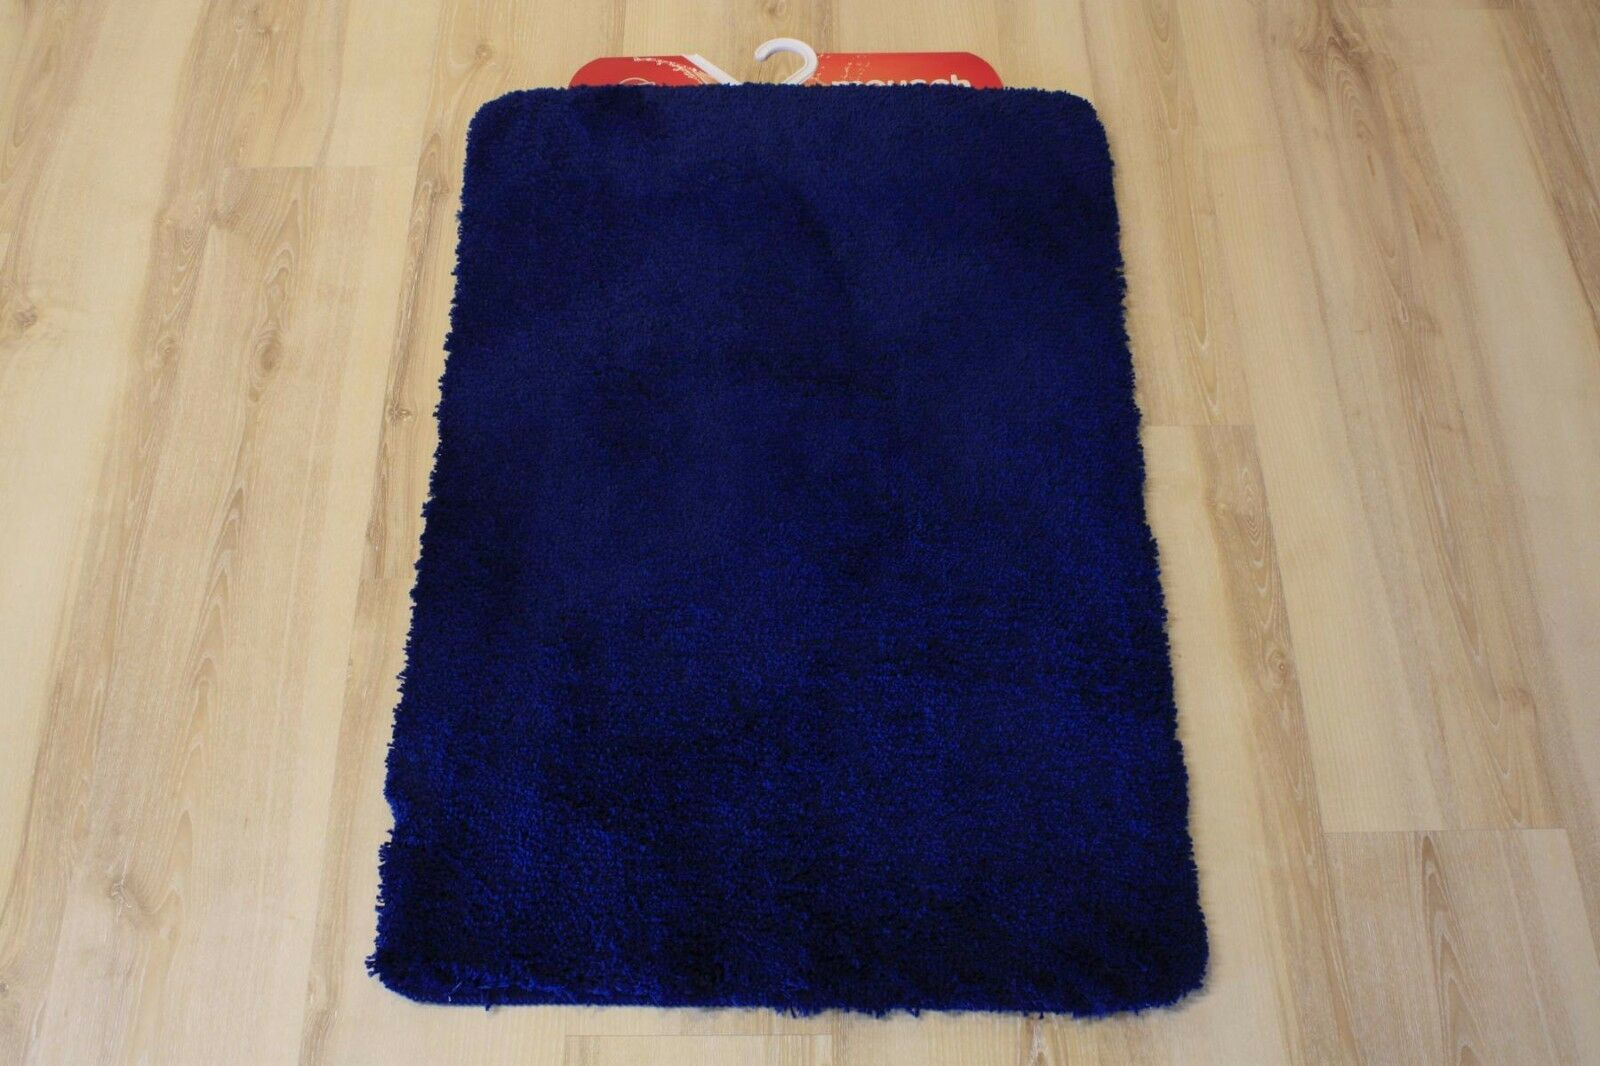 Badteppich Badematte Meusch Super Soft 789 dunkelblau 70x120cm